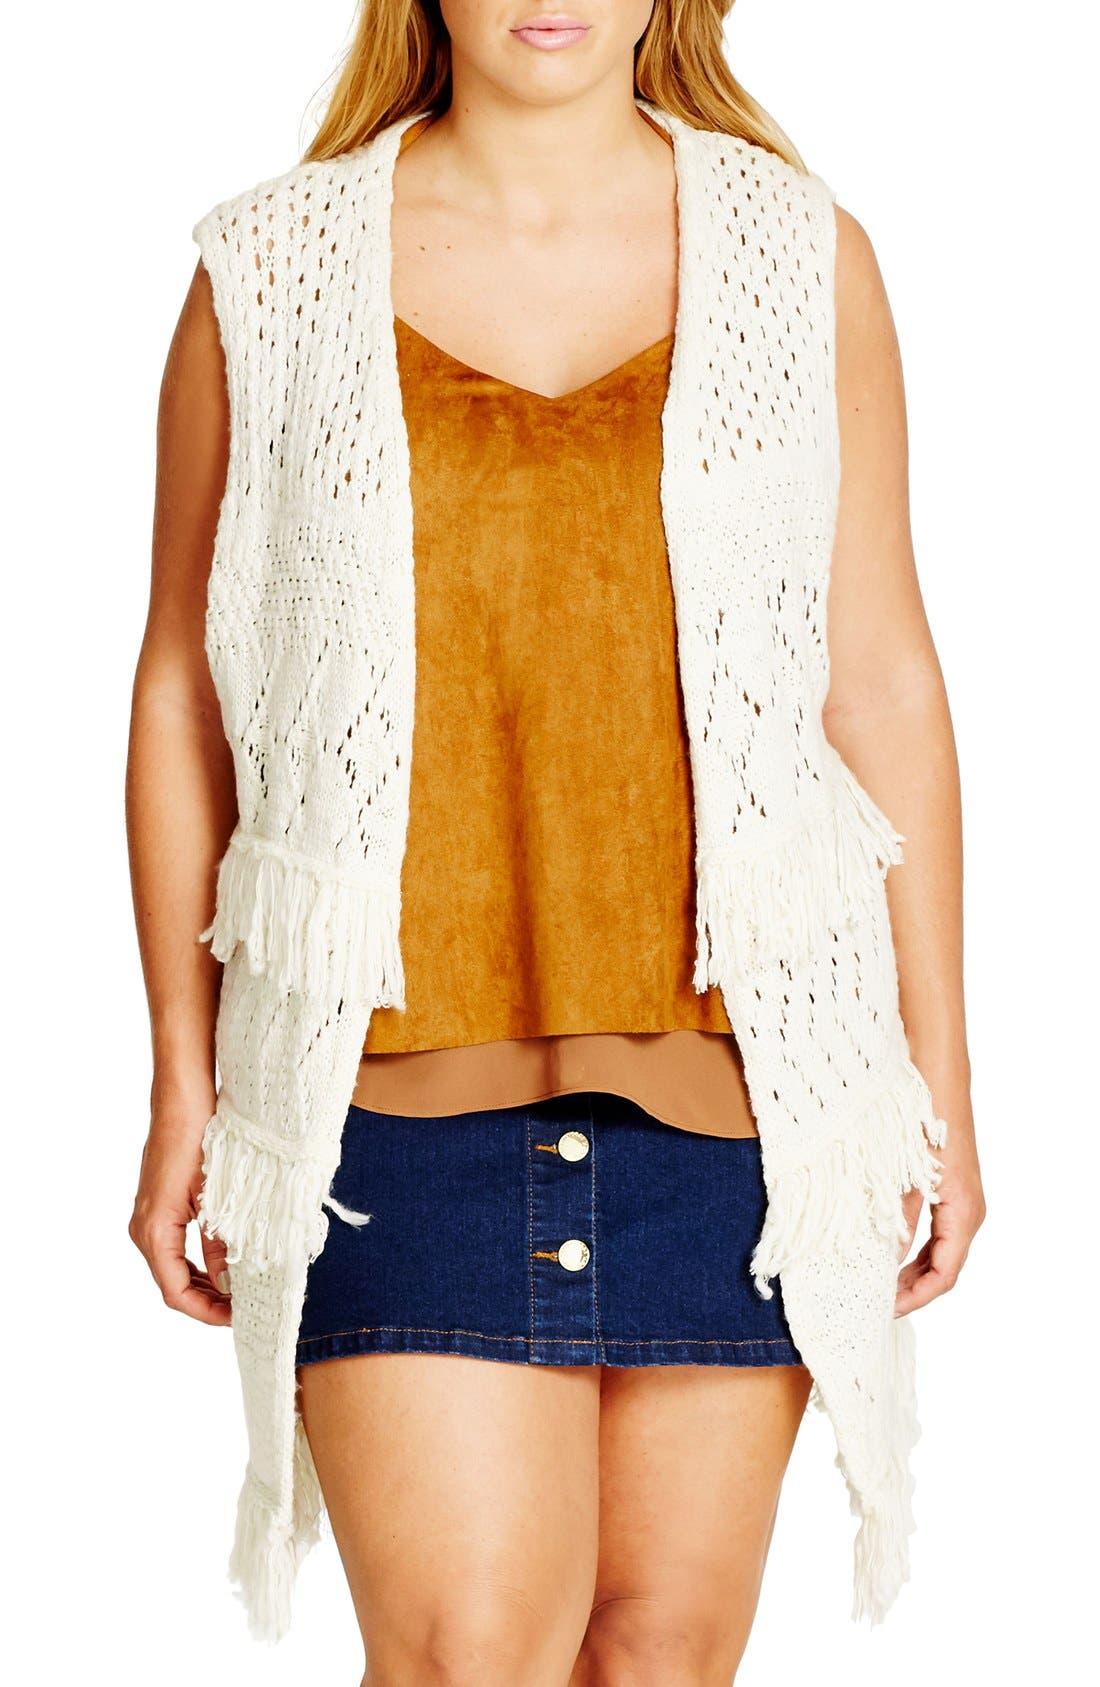 Alternate Image 1 Selected - City Chic Cocoon Vest (Plus Size)